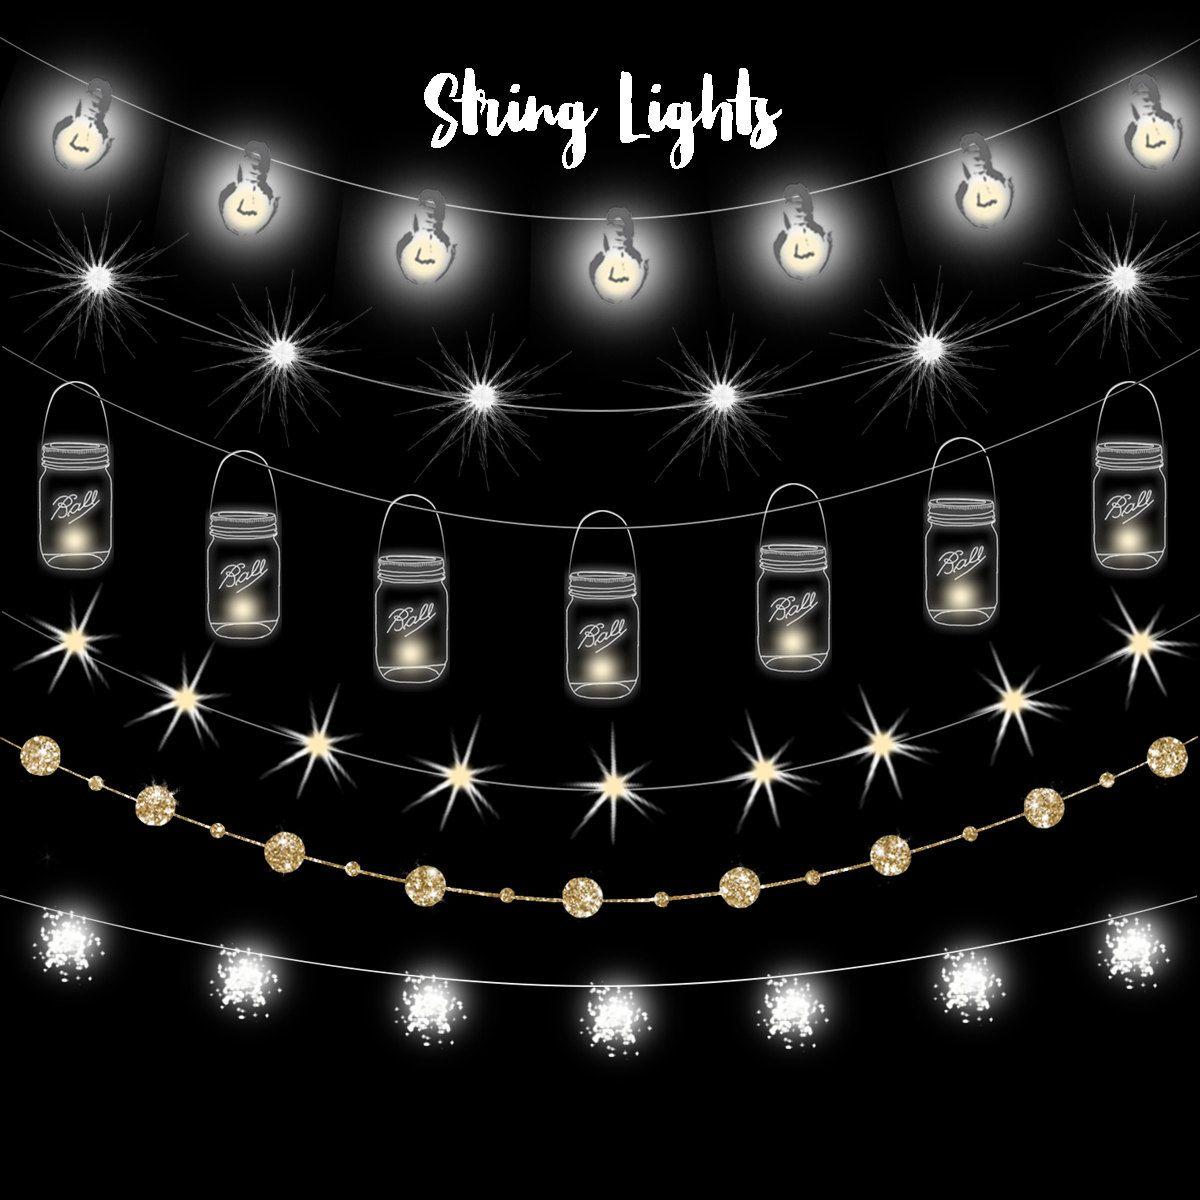 Mason jar lights clipart image freeuse stock String lights clipart, Fairy lights clipart, party lights clipart ... image freeuse stock